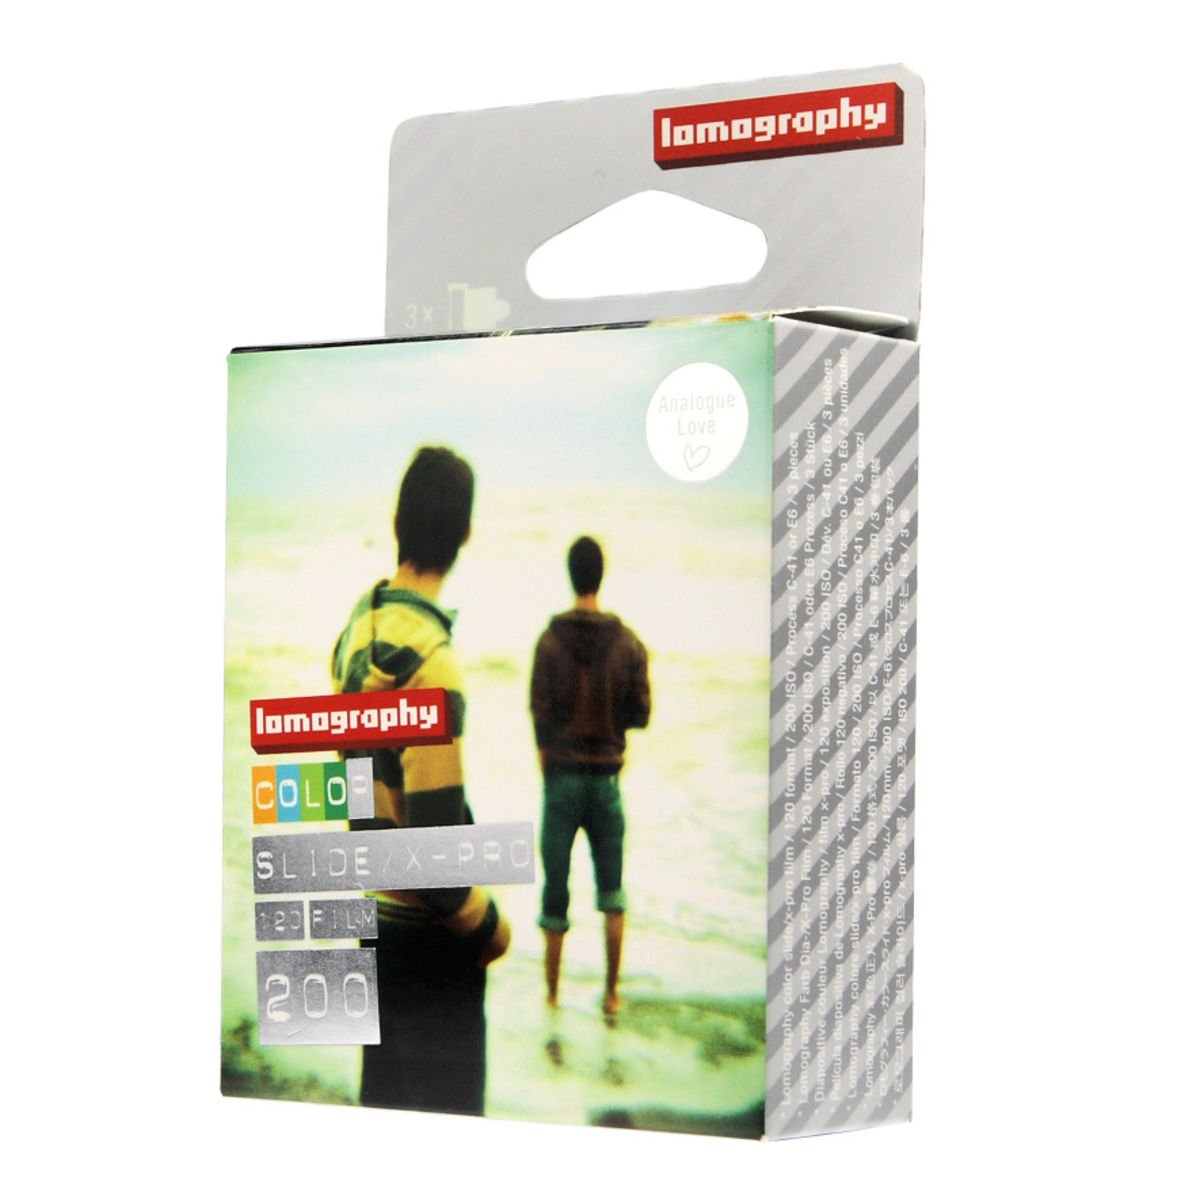 amazon lomography x pro slide 200 120 3 pack クロスプロセス現像用